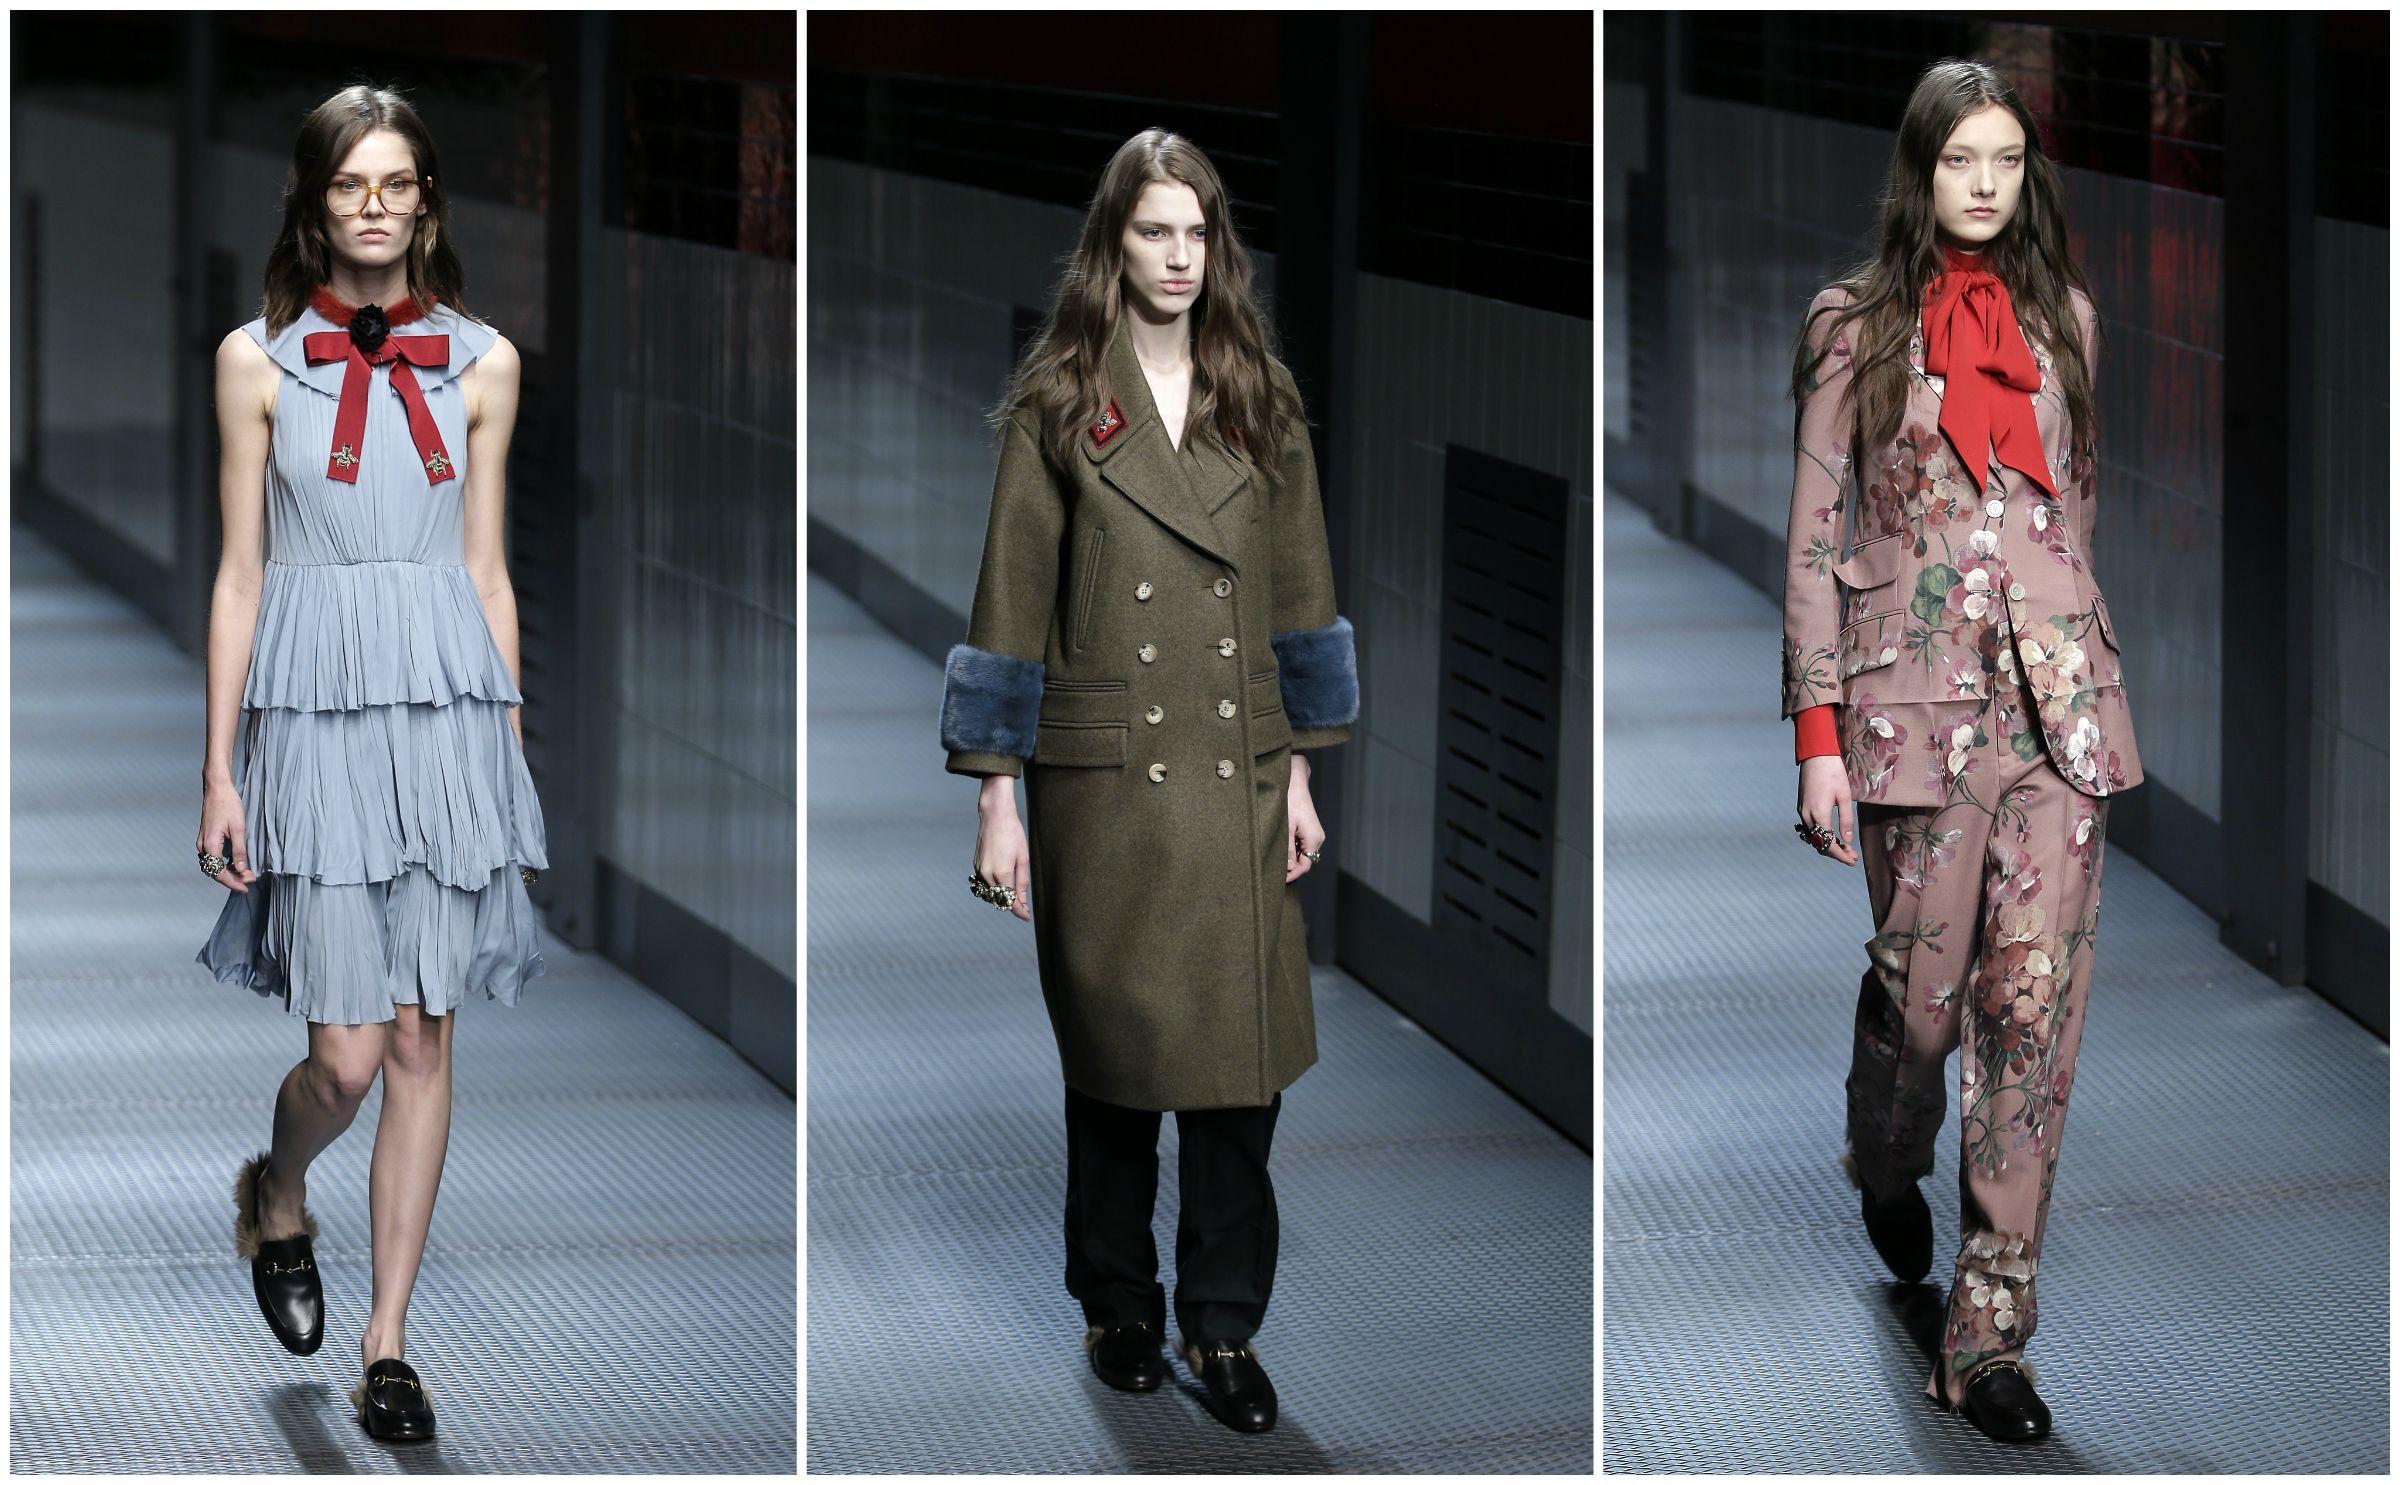 gucci, milan fashion week, fall 2015, alessandro michele, fashion, style, womenswear